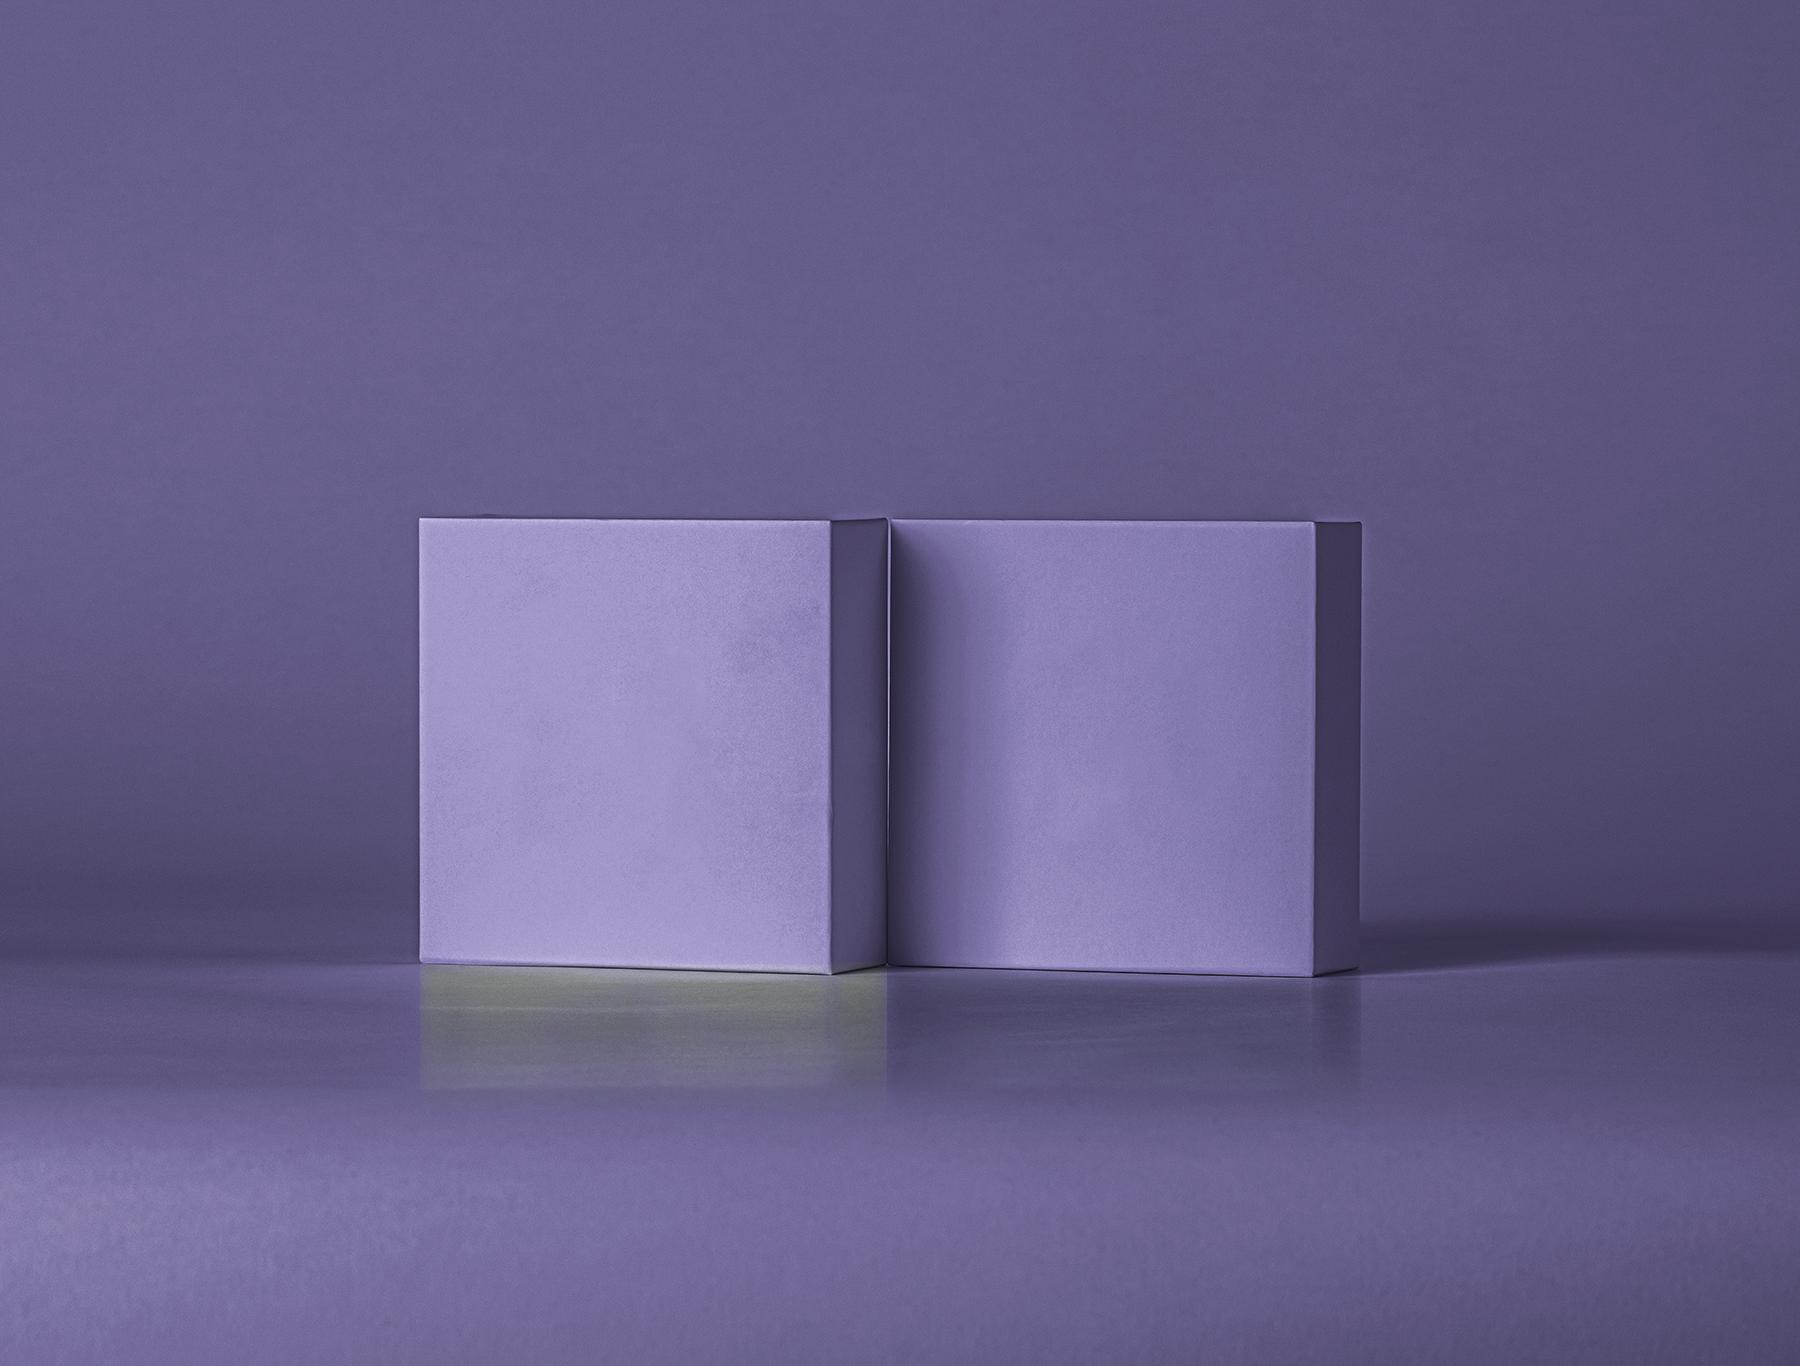 Free Small Square Boxes Mockup